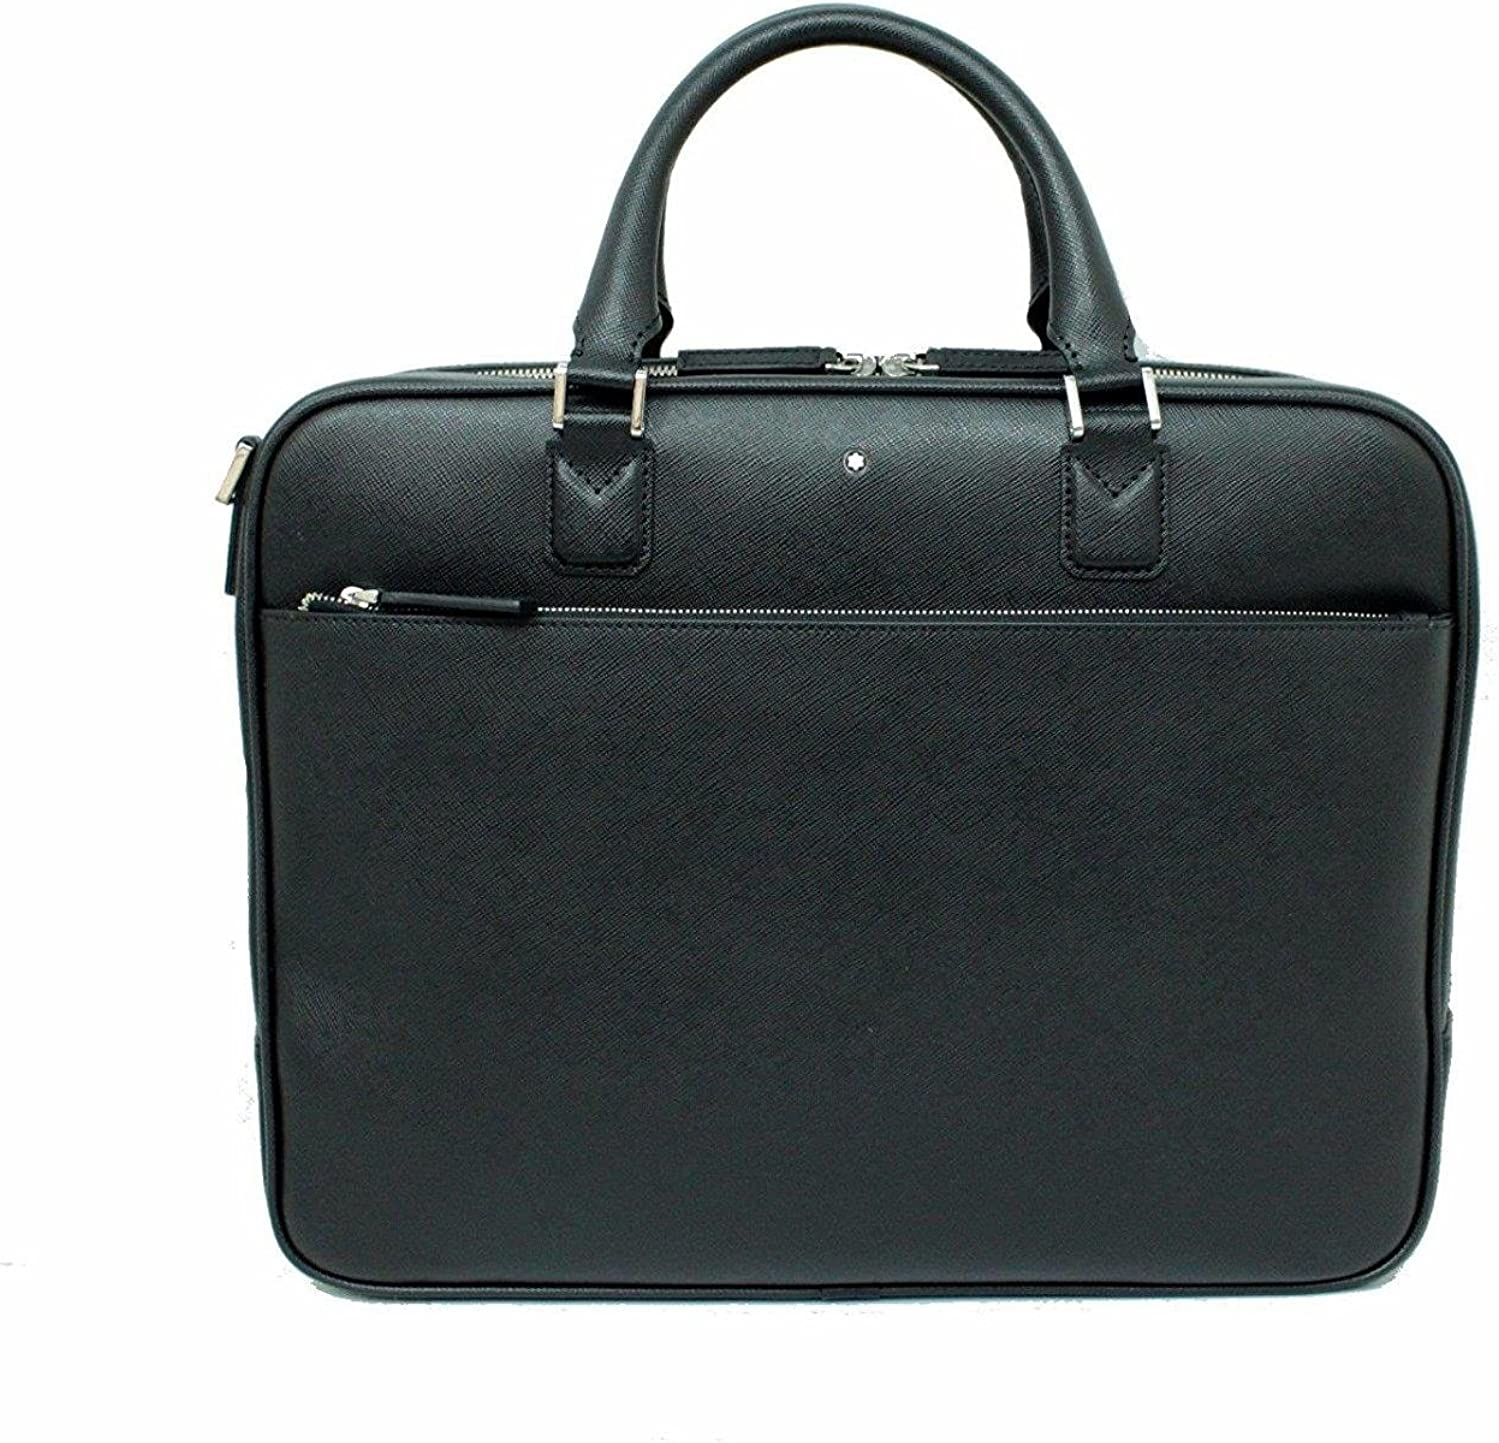 Montblanc Messenger Bag, Black